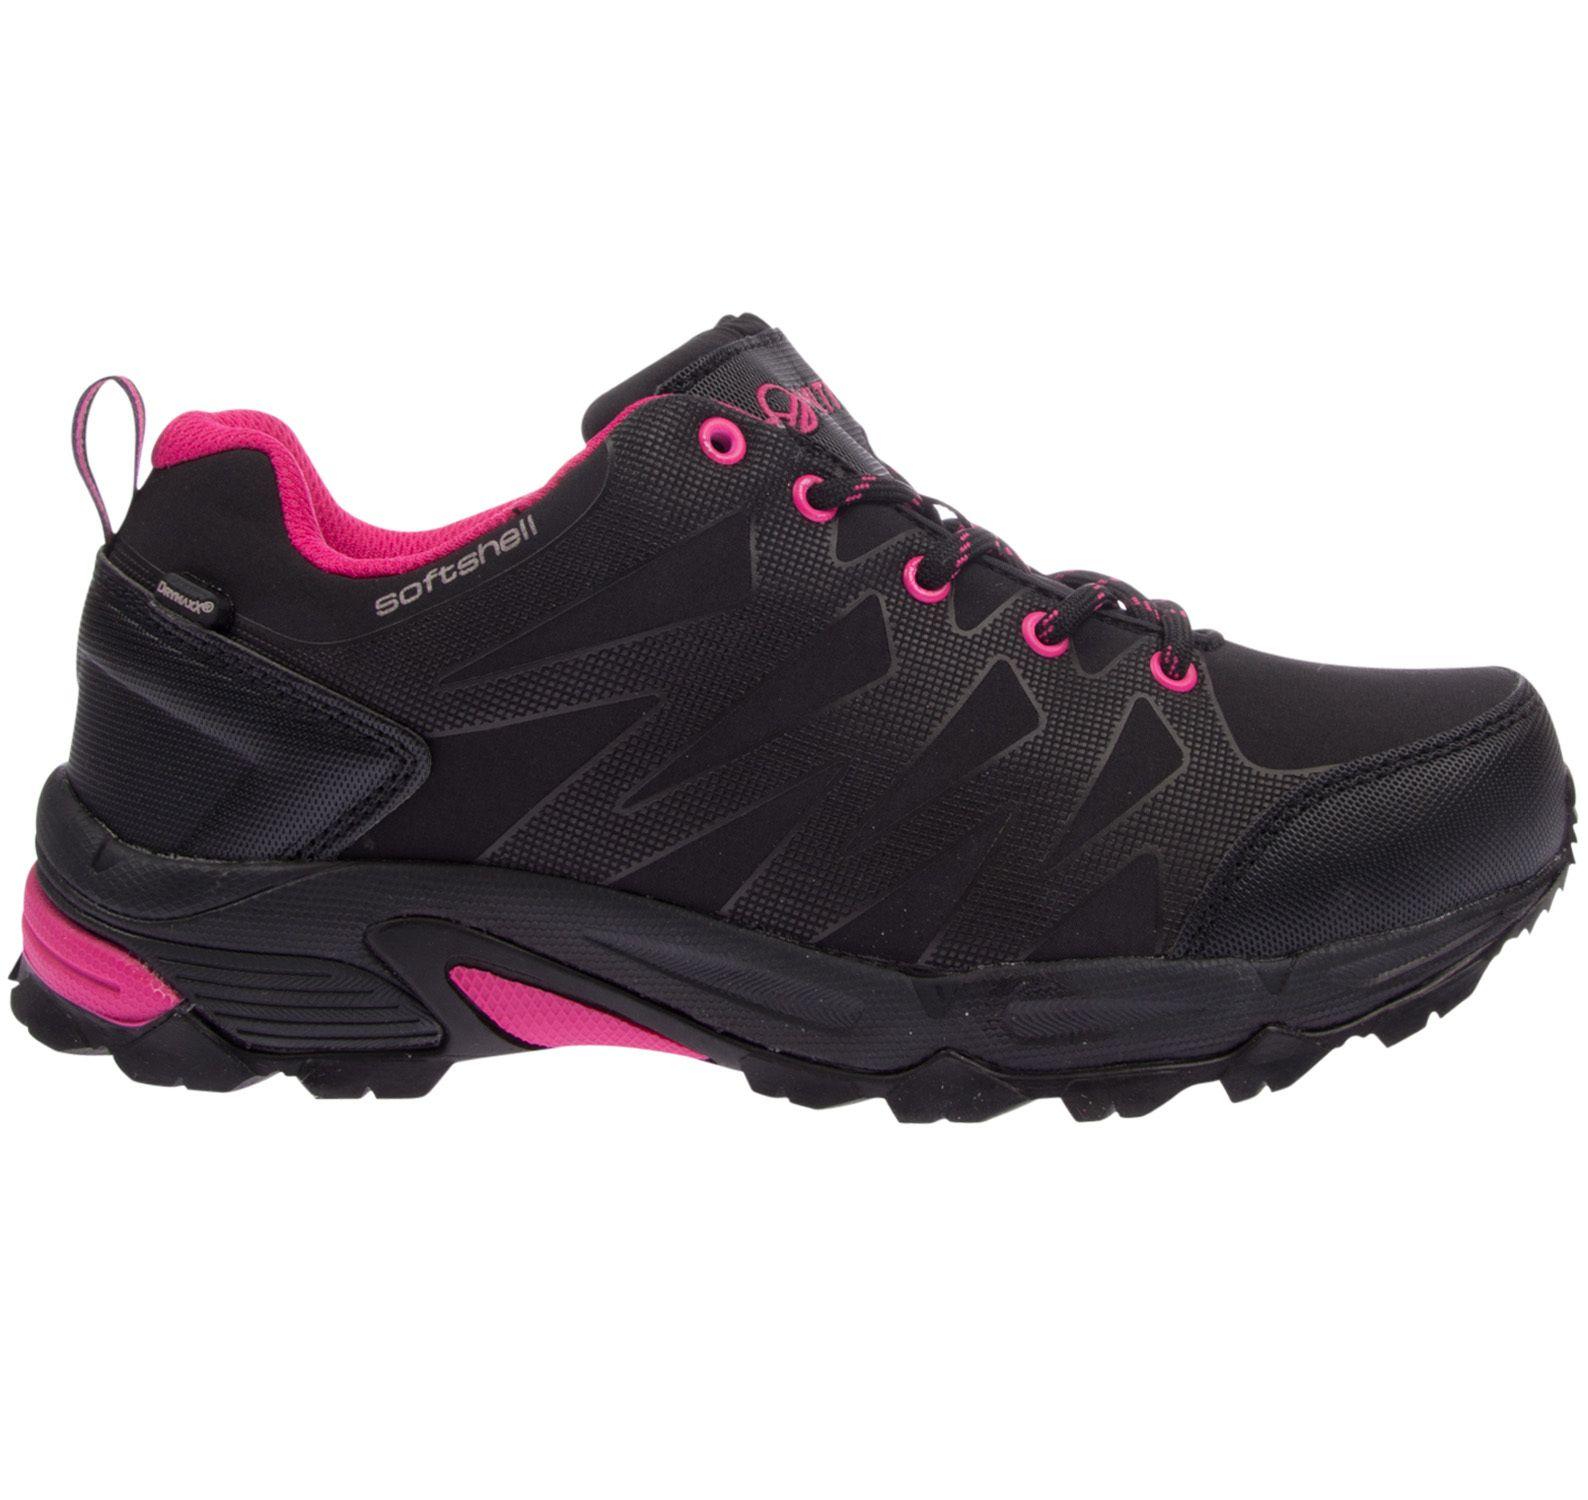 Tano Dx W Trekking Shoe, Black, 40,  Halti